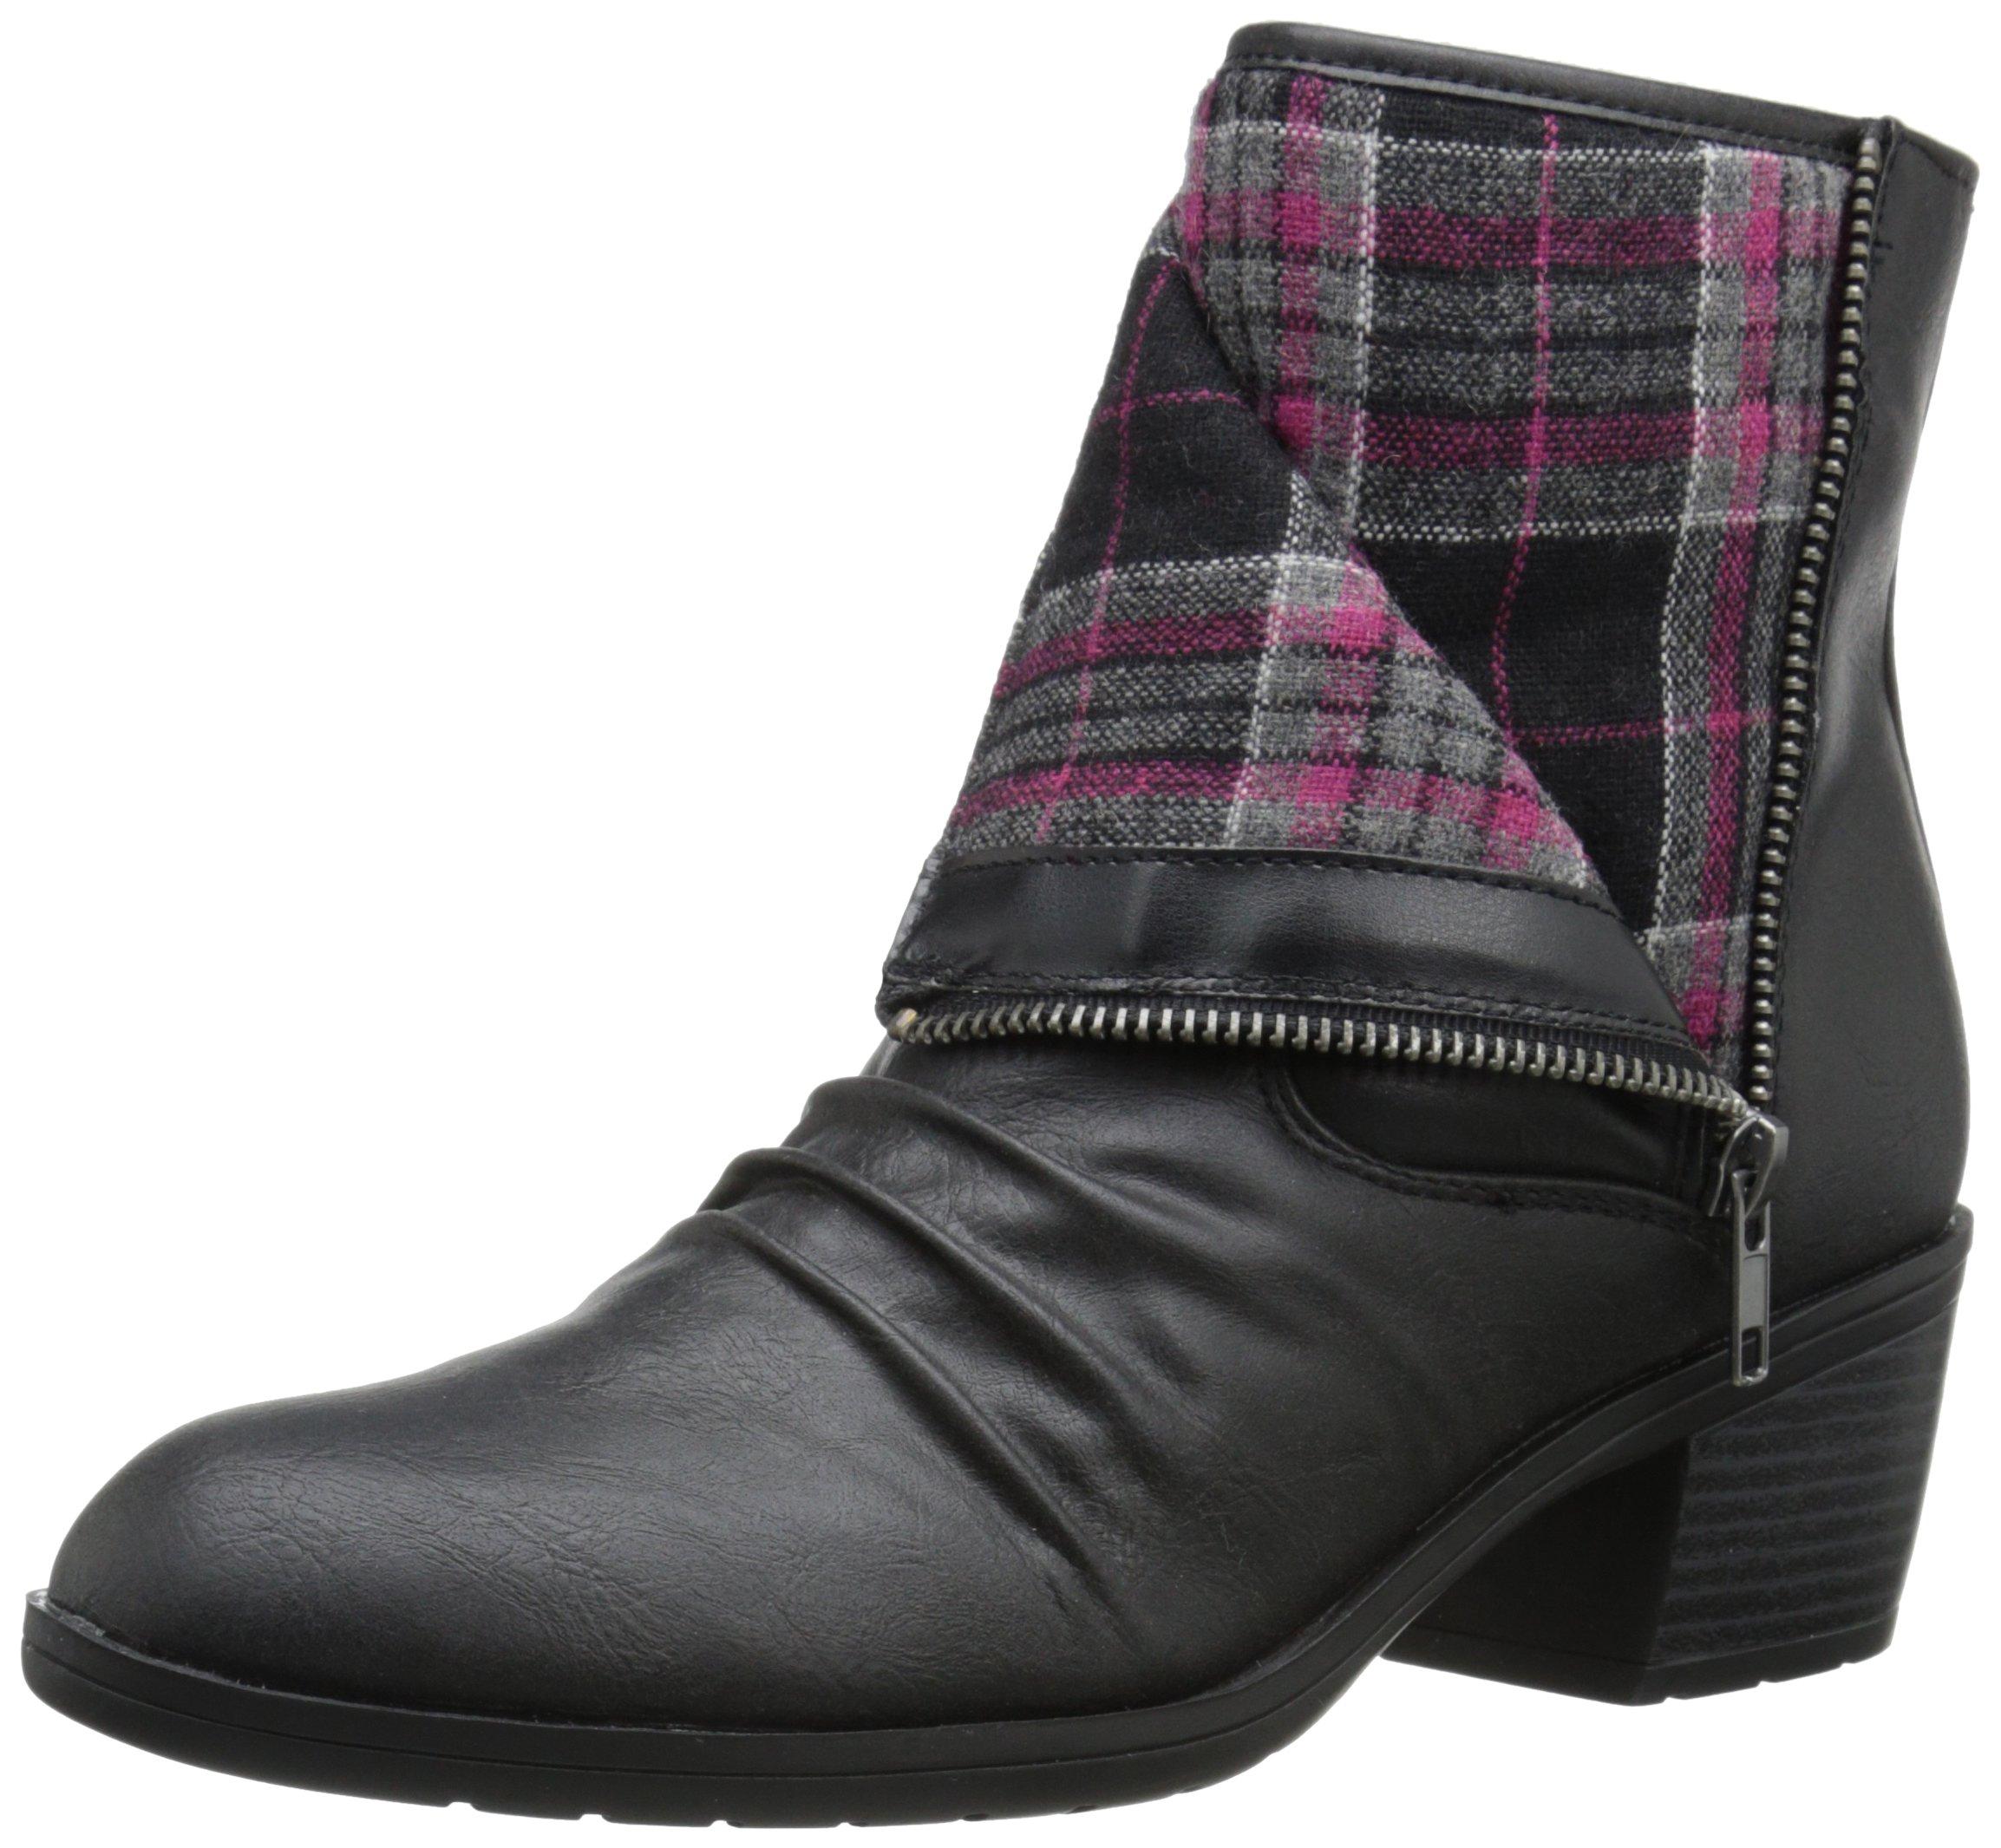 LifeStride Women's Watchful Boot, Black, 6.5 M US